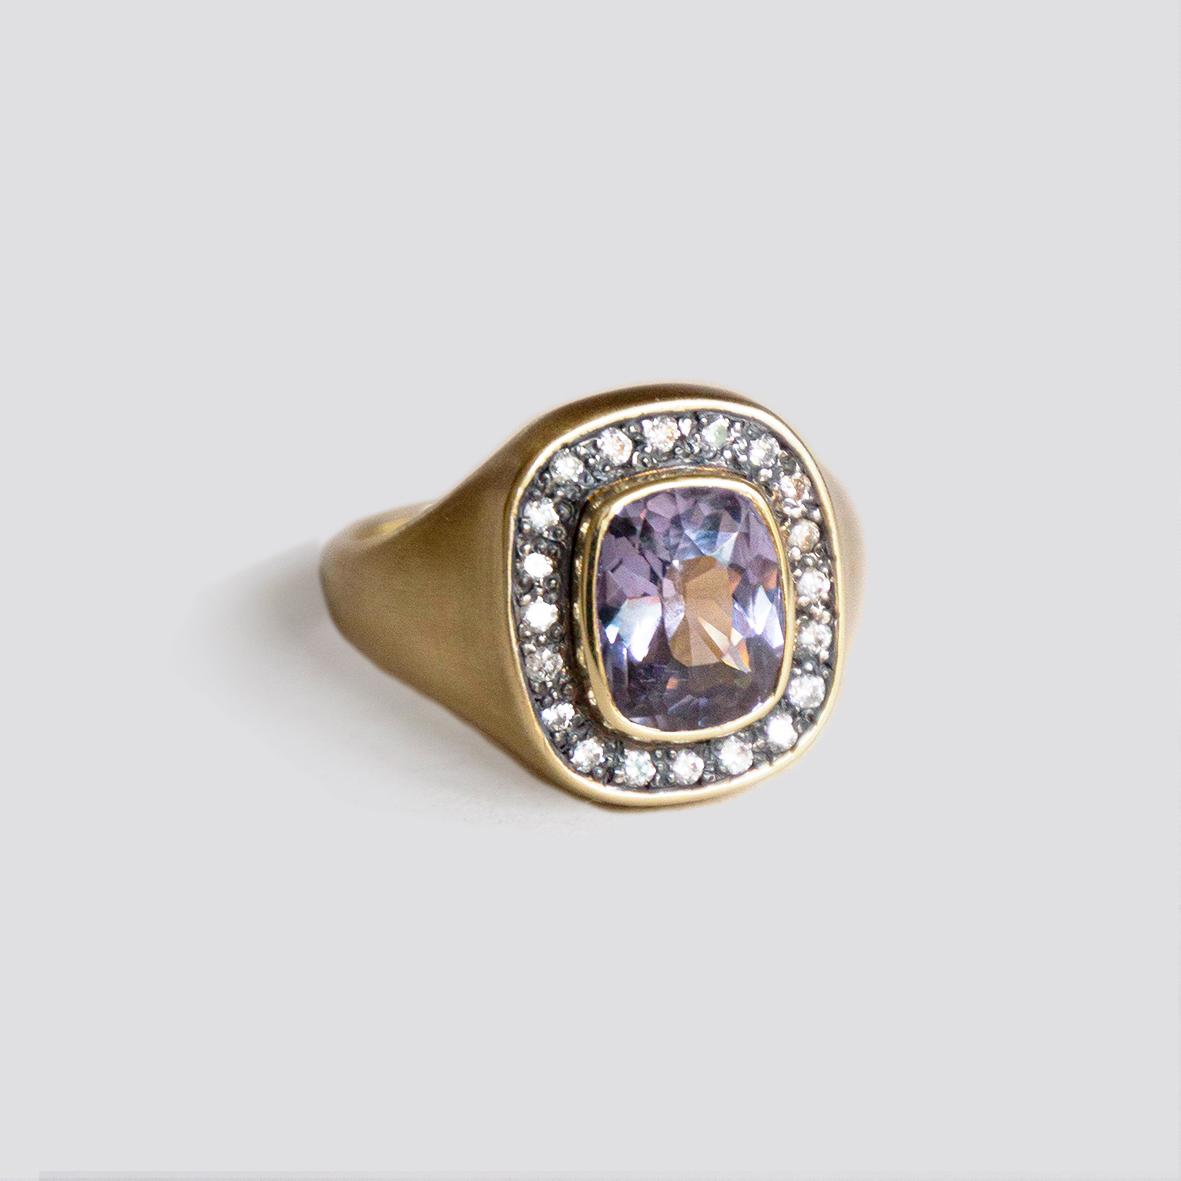 2. OONA__lotus_ficha 1_spinel signet ring